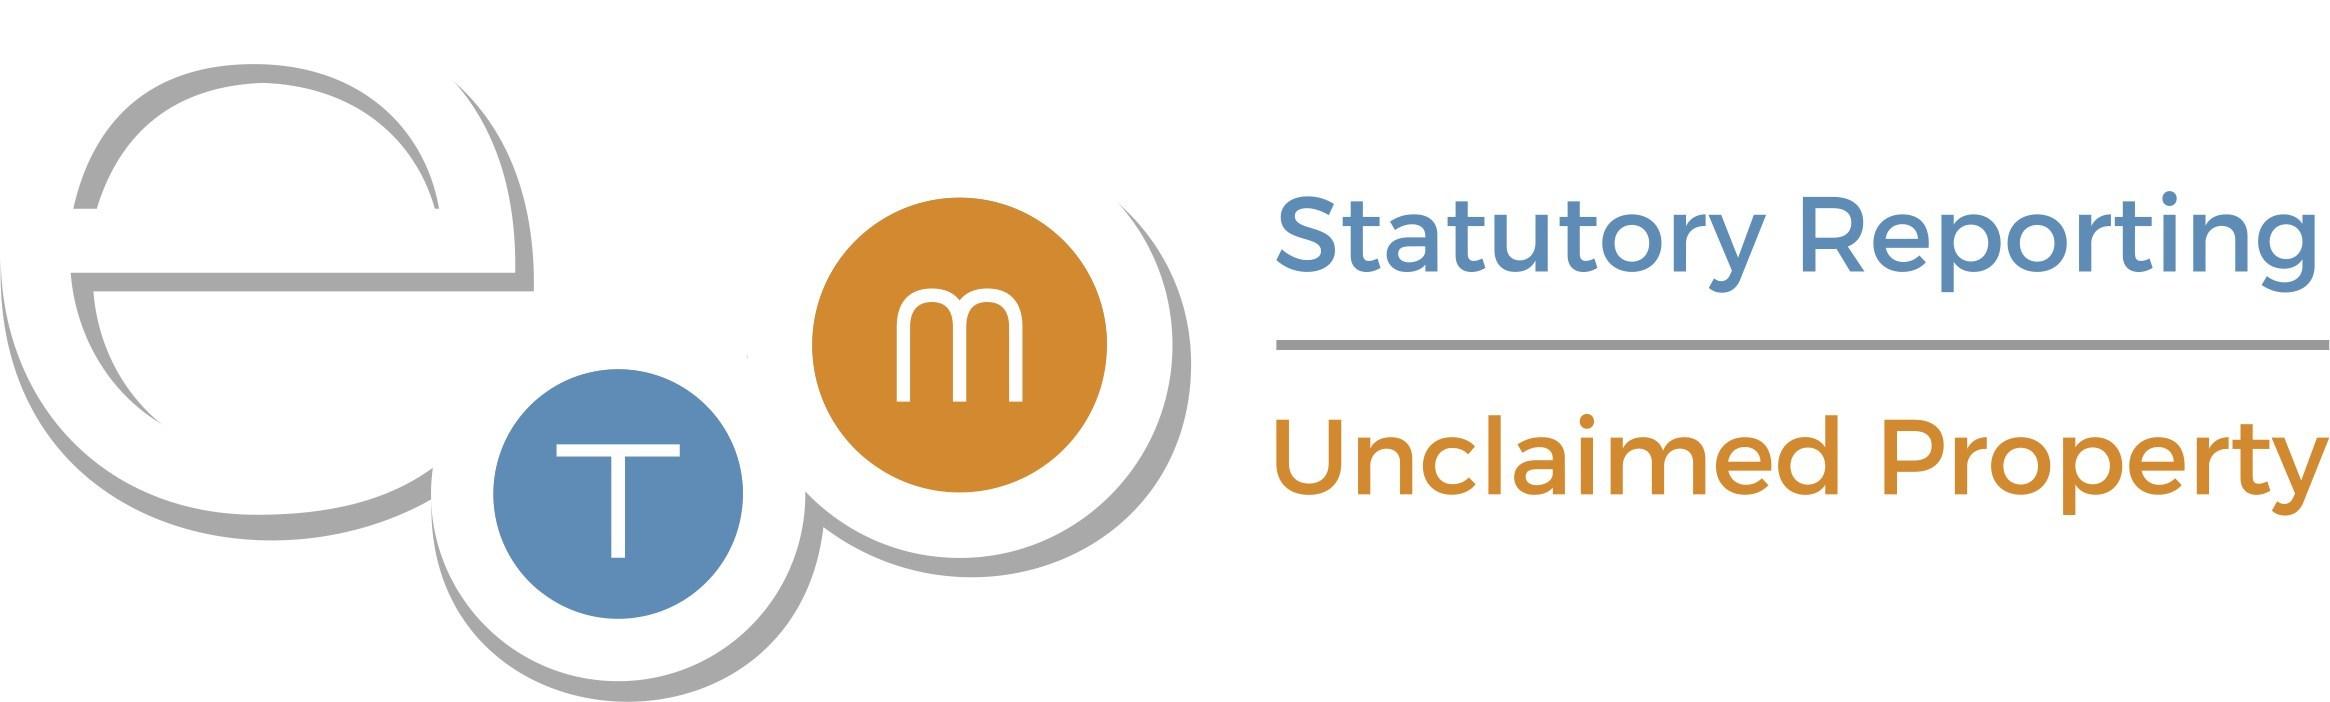 ETM announces a new website and company logo.